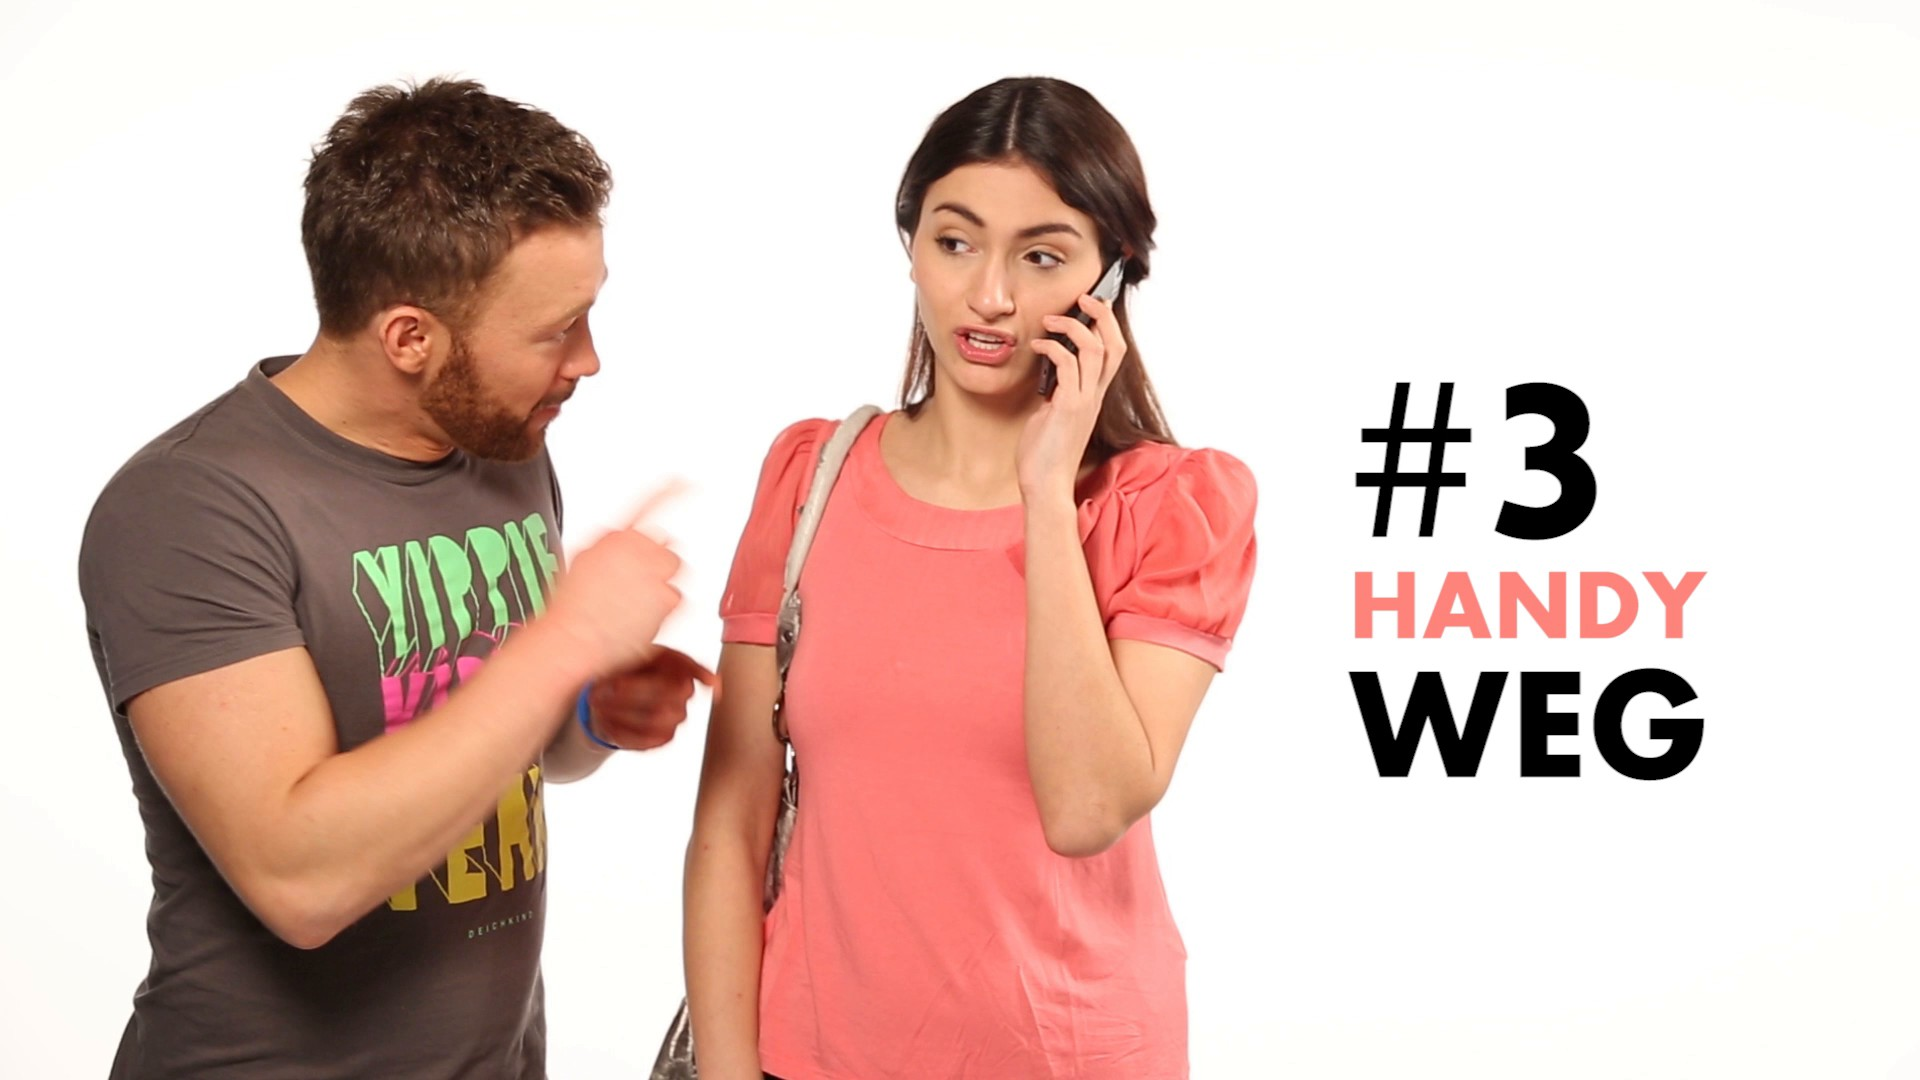 Dating-Knigge 10 ultimative Verhaltensregeln fürs erste Date_EL (1).mp4: image 2